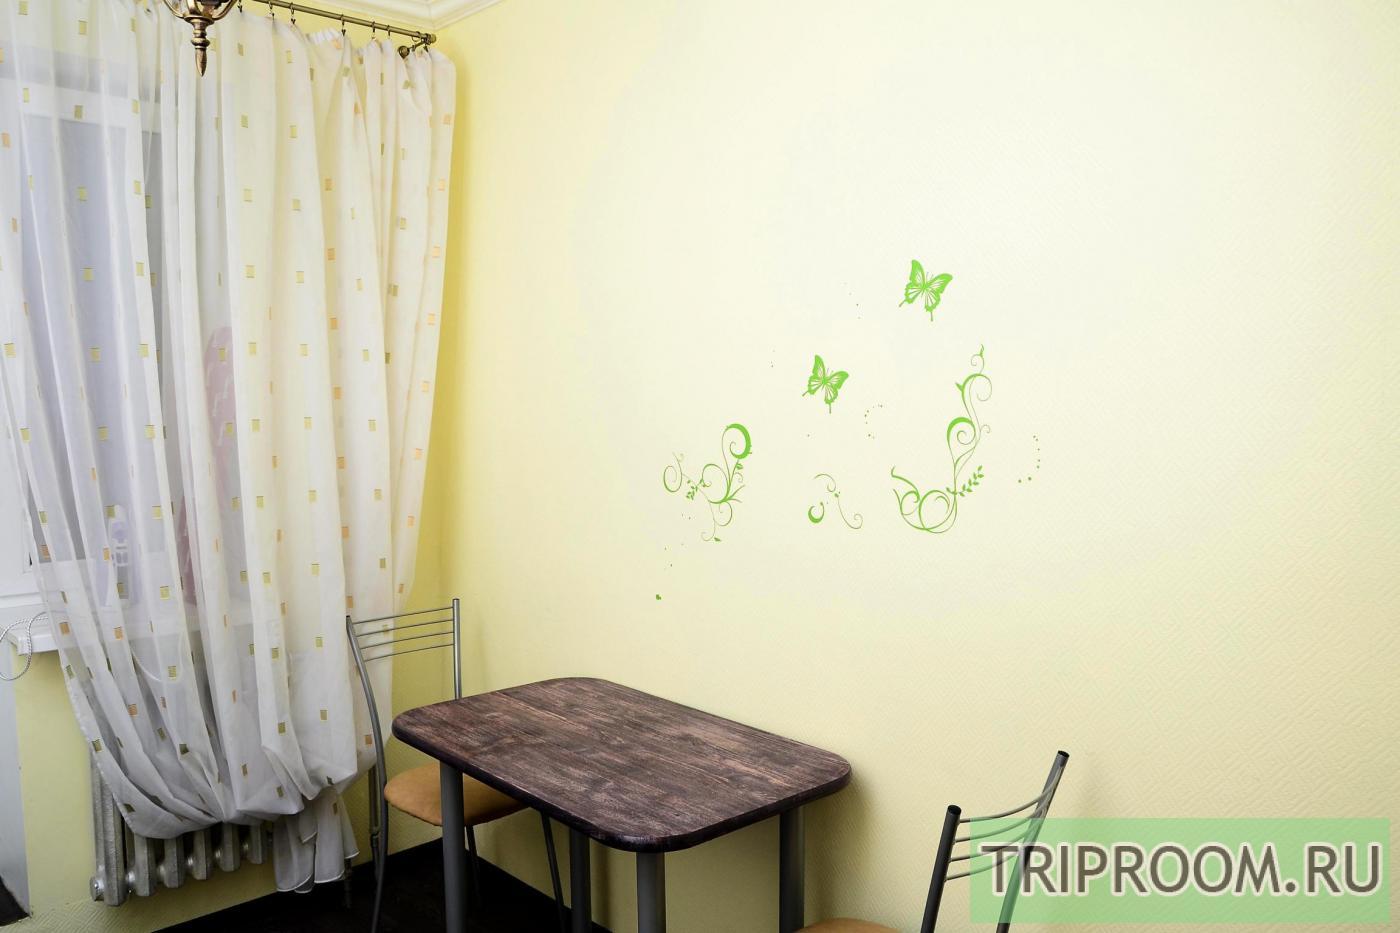 1-комнатная квартира посуточно (вариант № 14713), ул. Петра Смородина улица, фото № 20